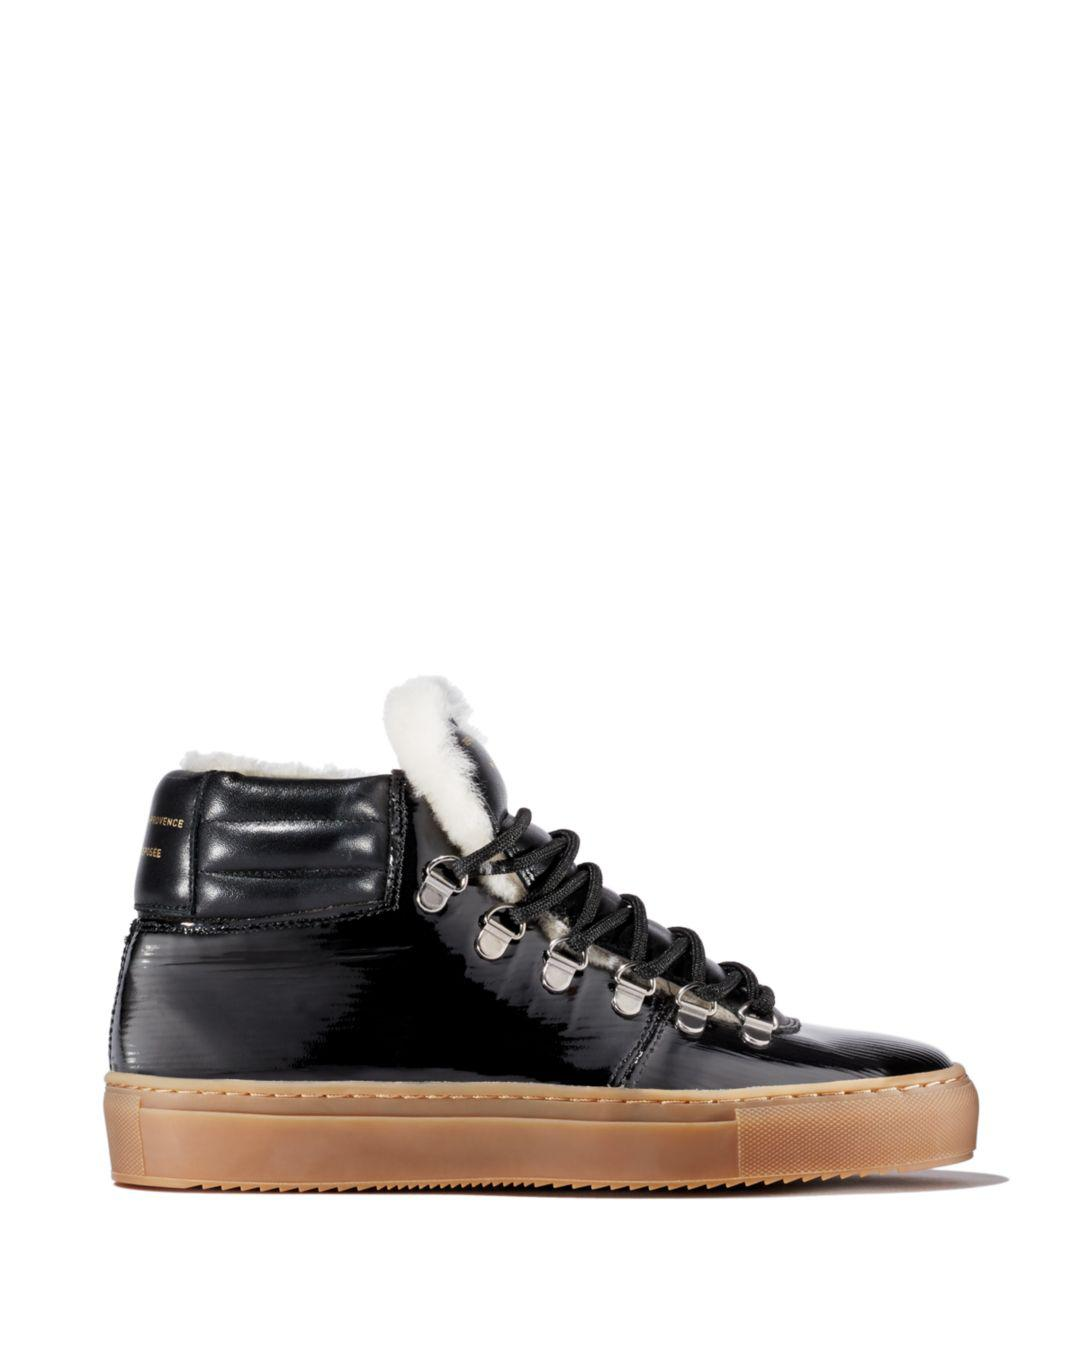 6b757b4f2f7 Zespà - Black Women s Leather   Shearling Lace Up Platform Sneaker - Lyst.  View fullscreen